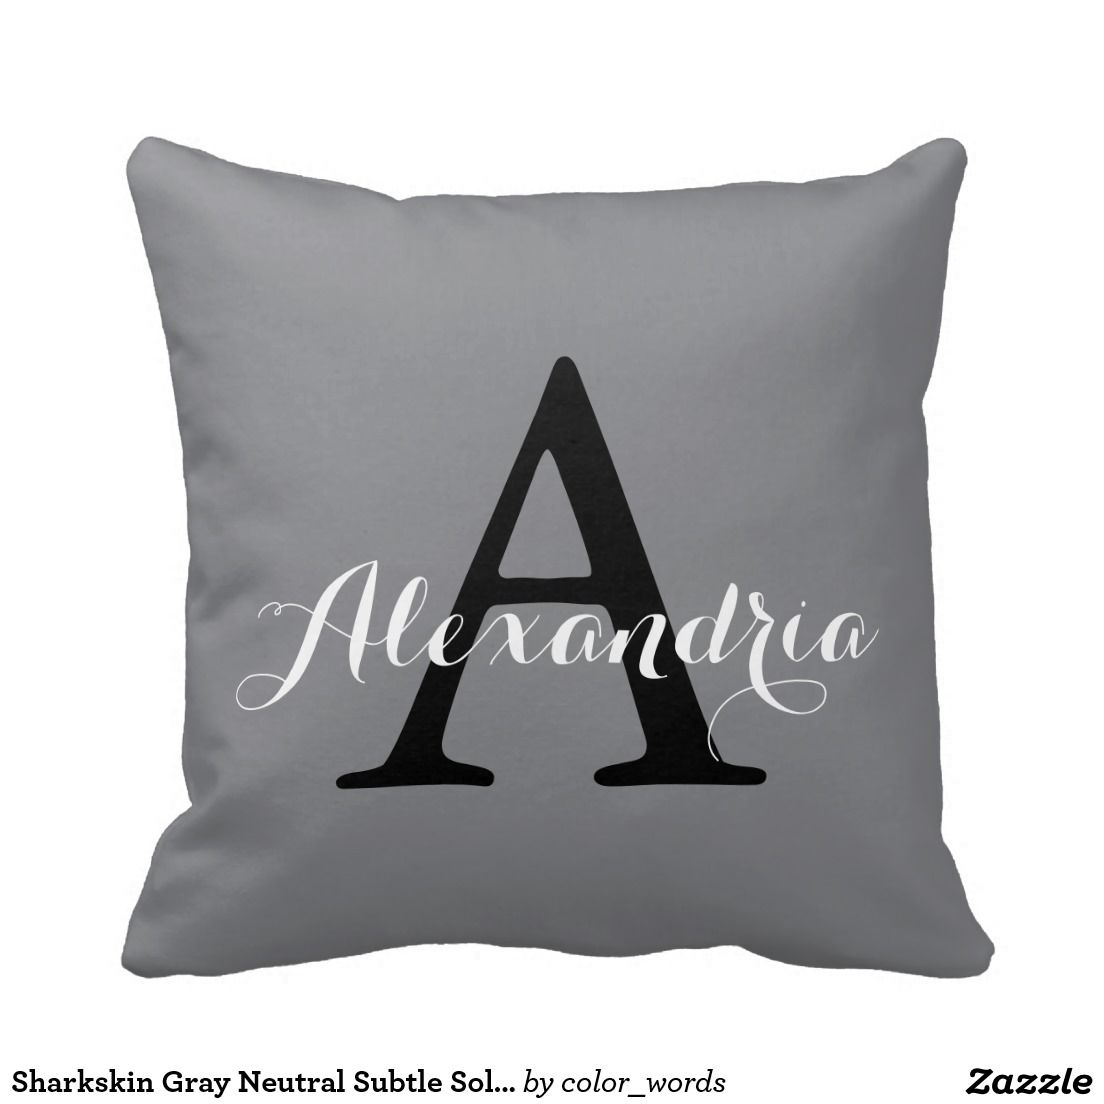 Sharkskin Gray Neutral Subtle Solid Color Monogram Pillow